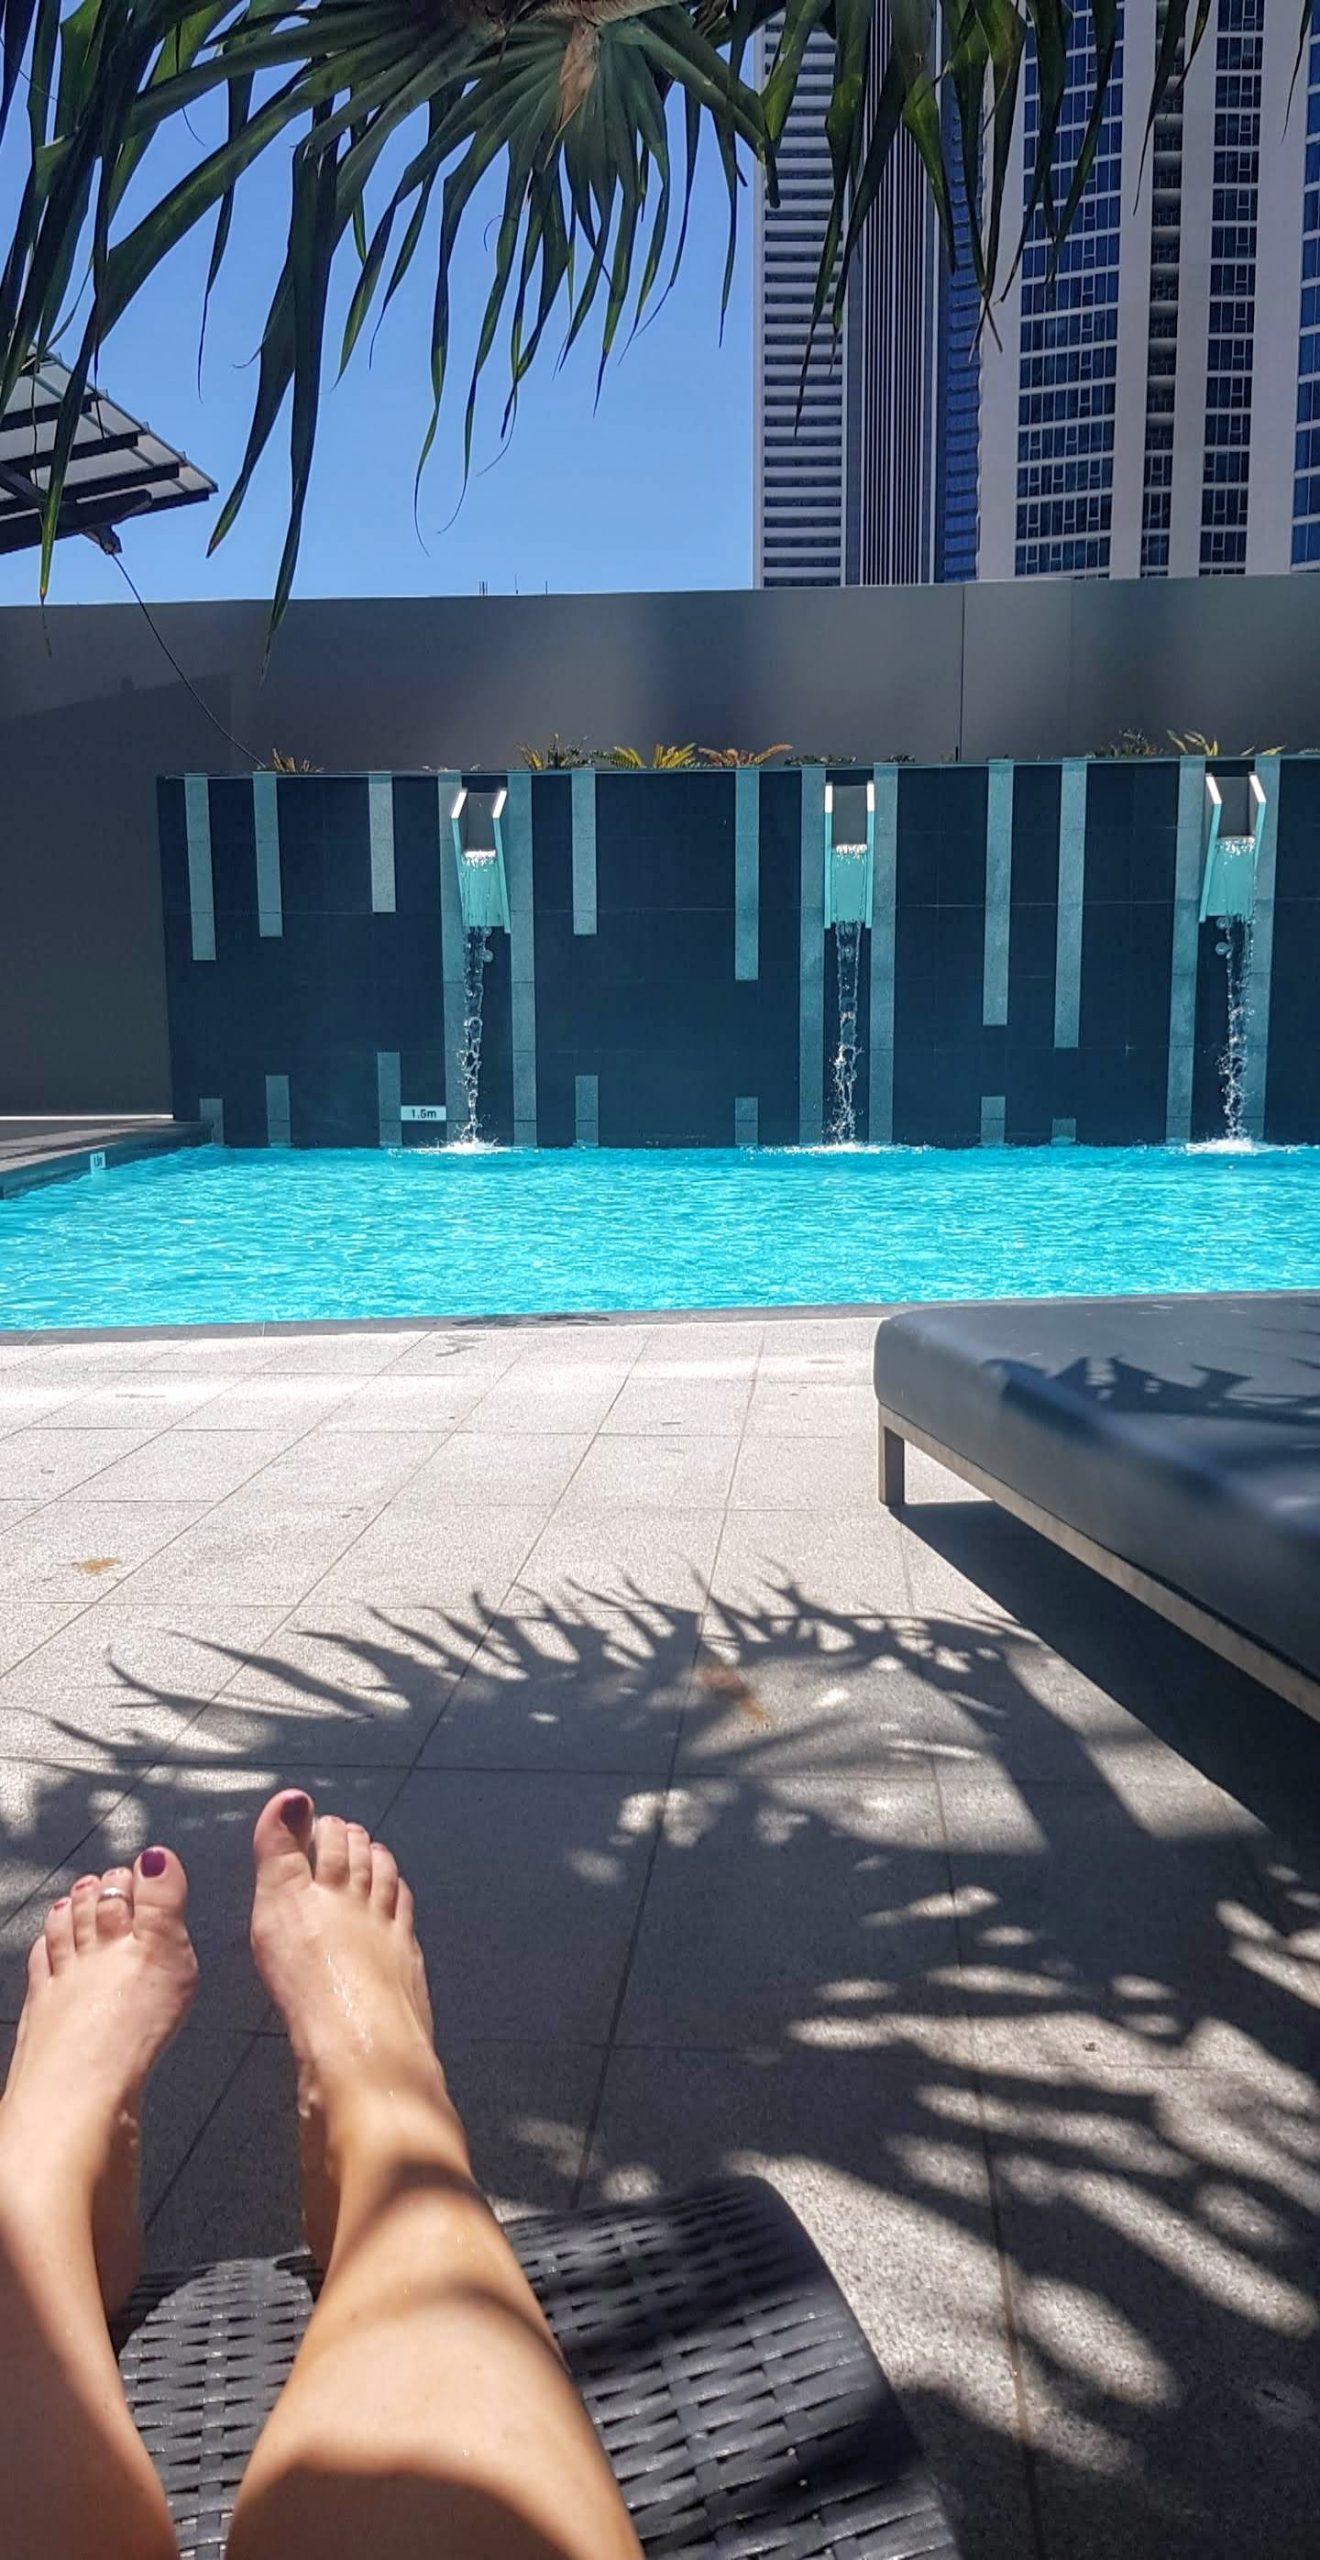 taking care feet self love beauty soul samantha clark waters blog poolside